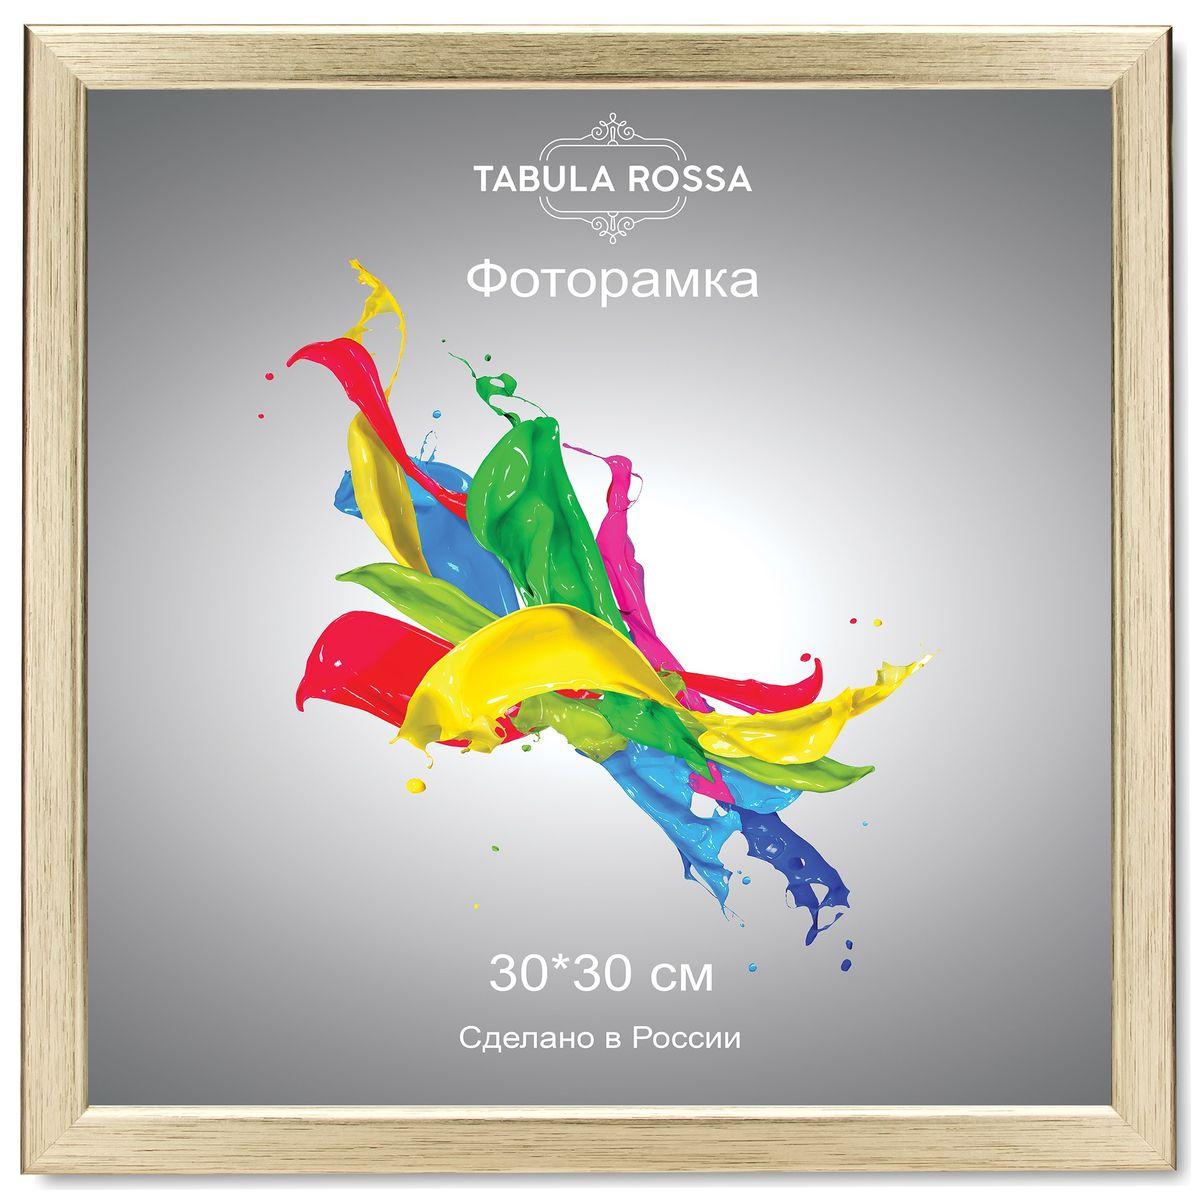 Фоторамка Tabula Rossa, цвет: золото, 30 х 30 см. ТР 5133ТР 5133